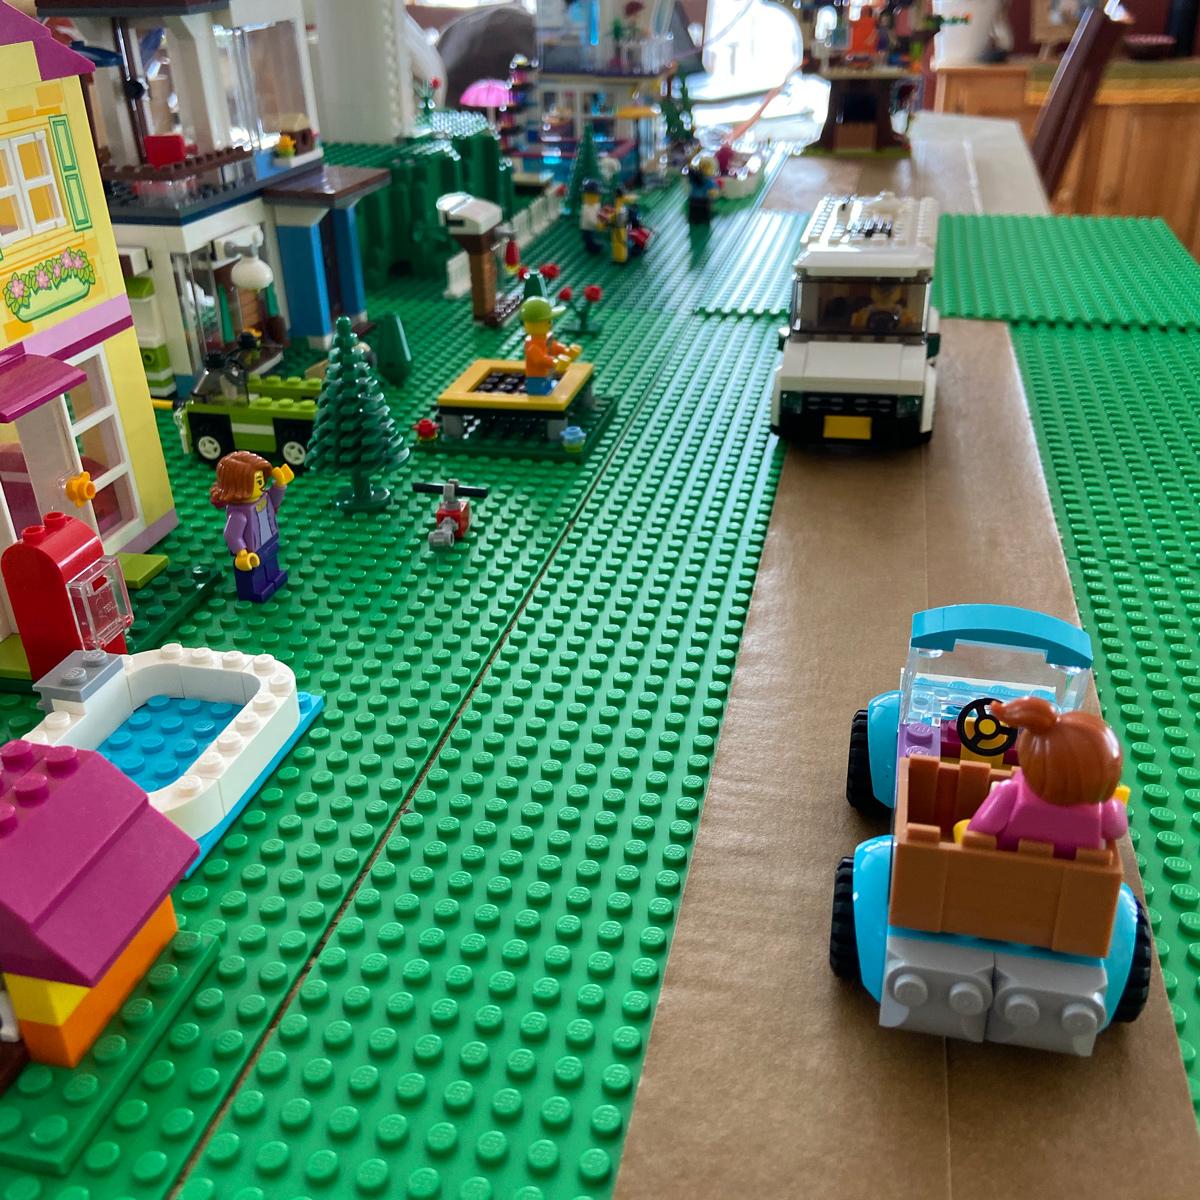 LEGO neighborhood under construction